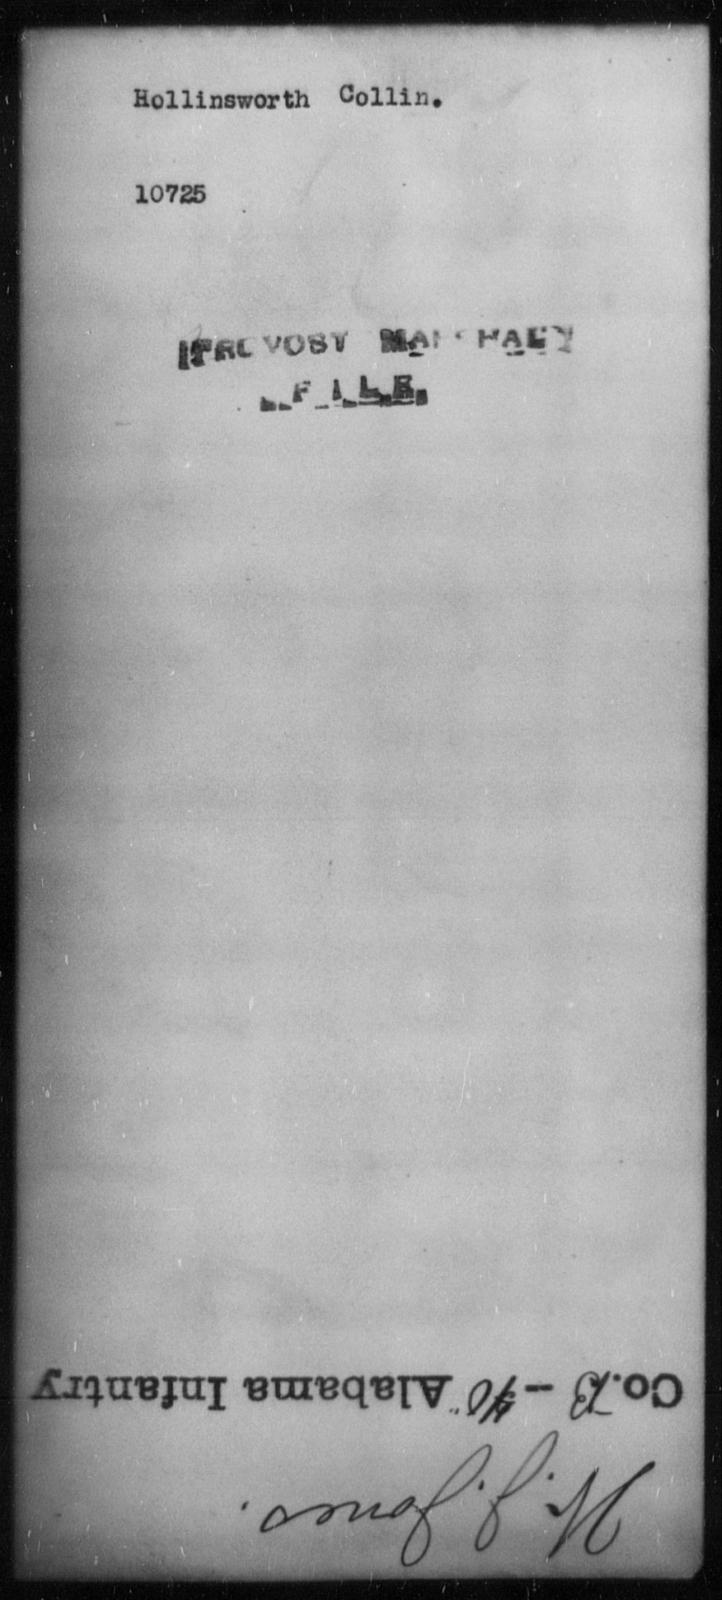 Hollinsworth, Collin - State: [Blank] - Year: [Blank]